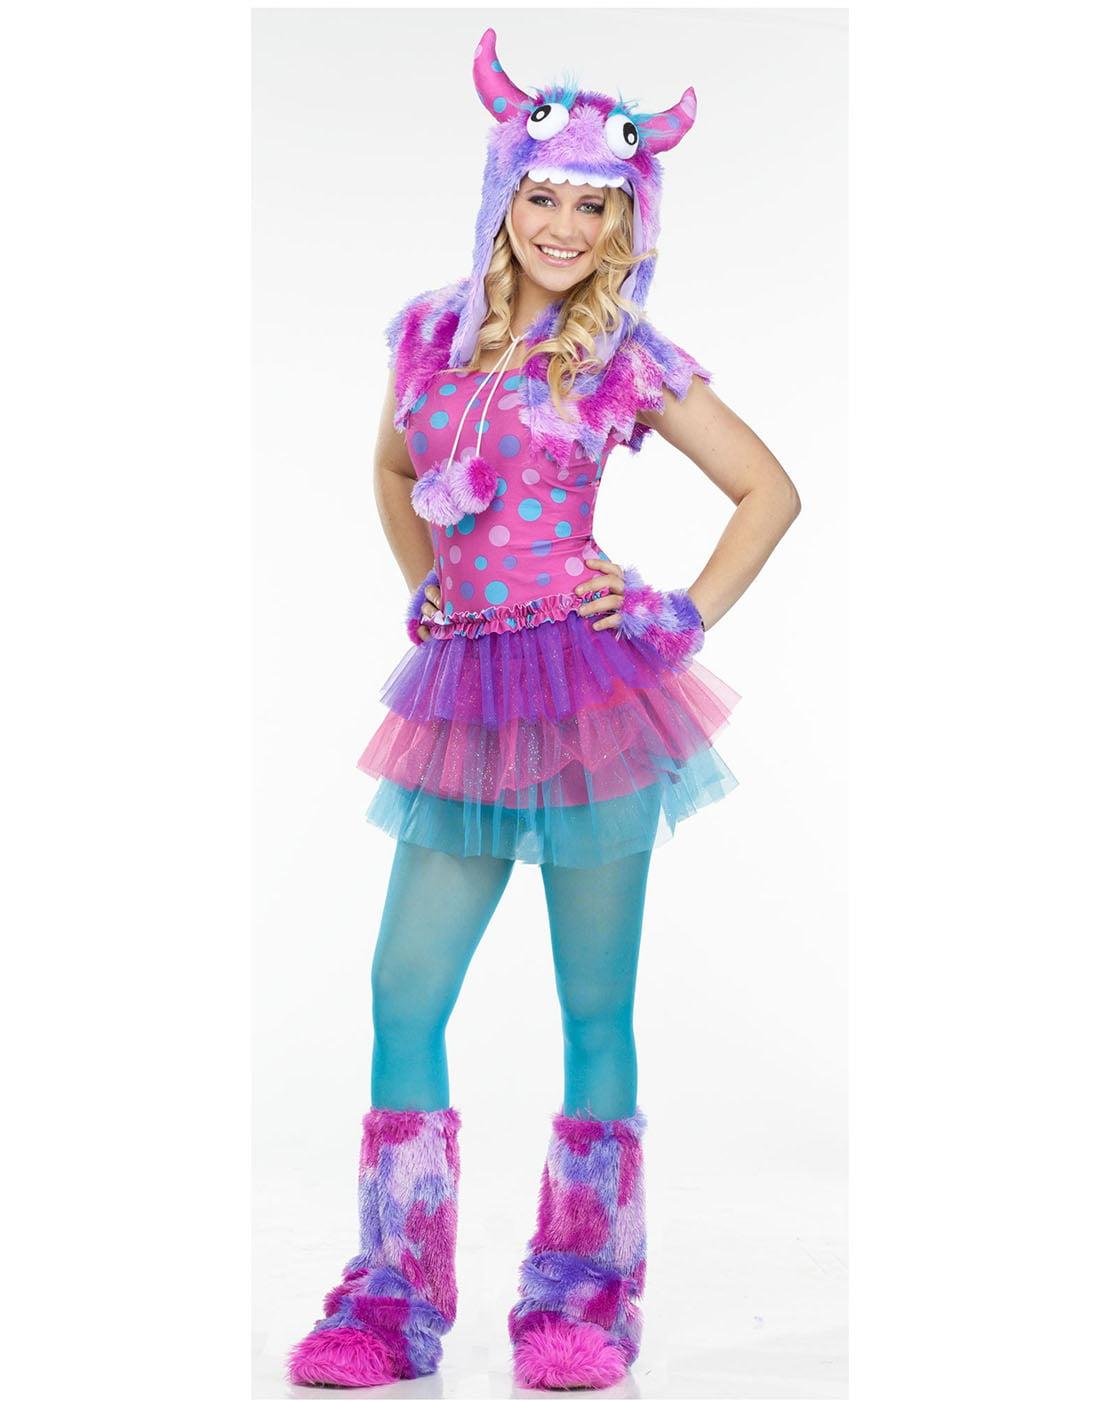 sc 1 st  Walmart.com & Polka Dot Monster Teen Halloween Costume - One Size - Walmart.com